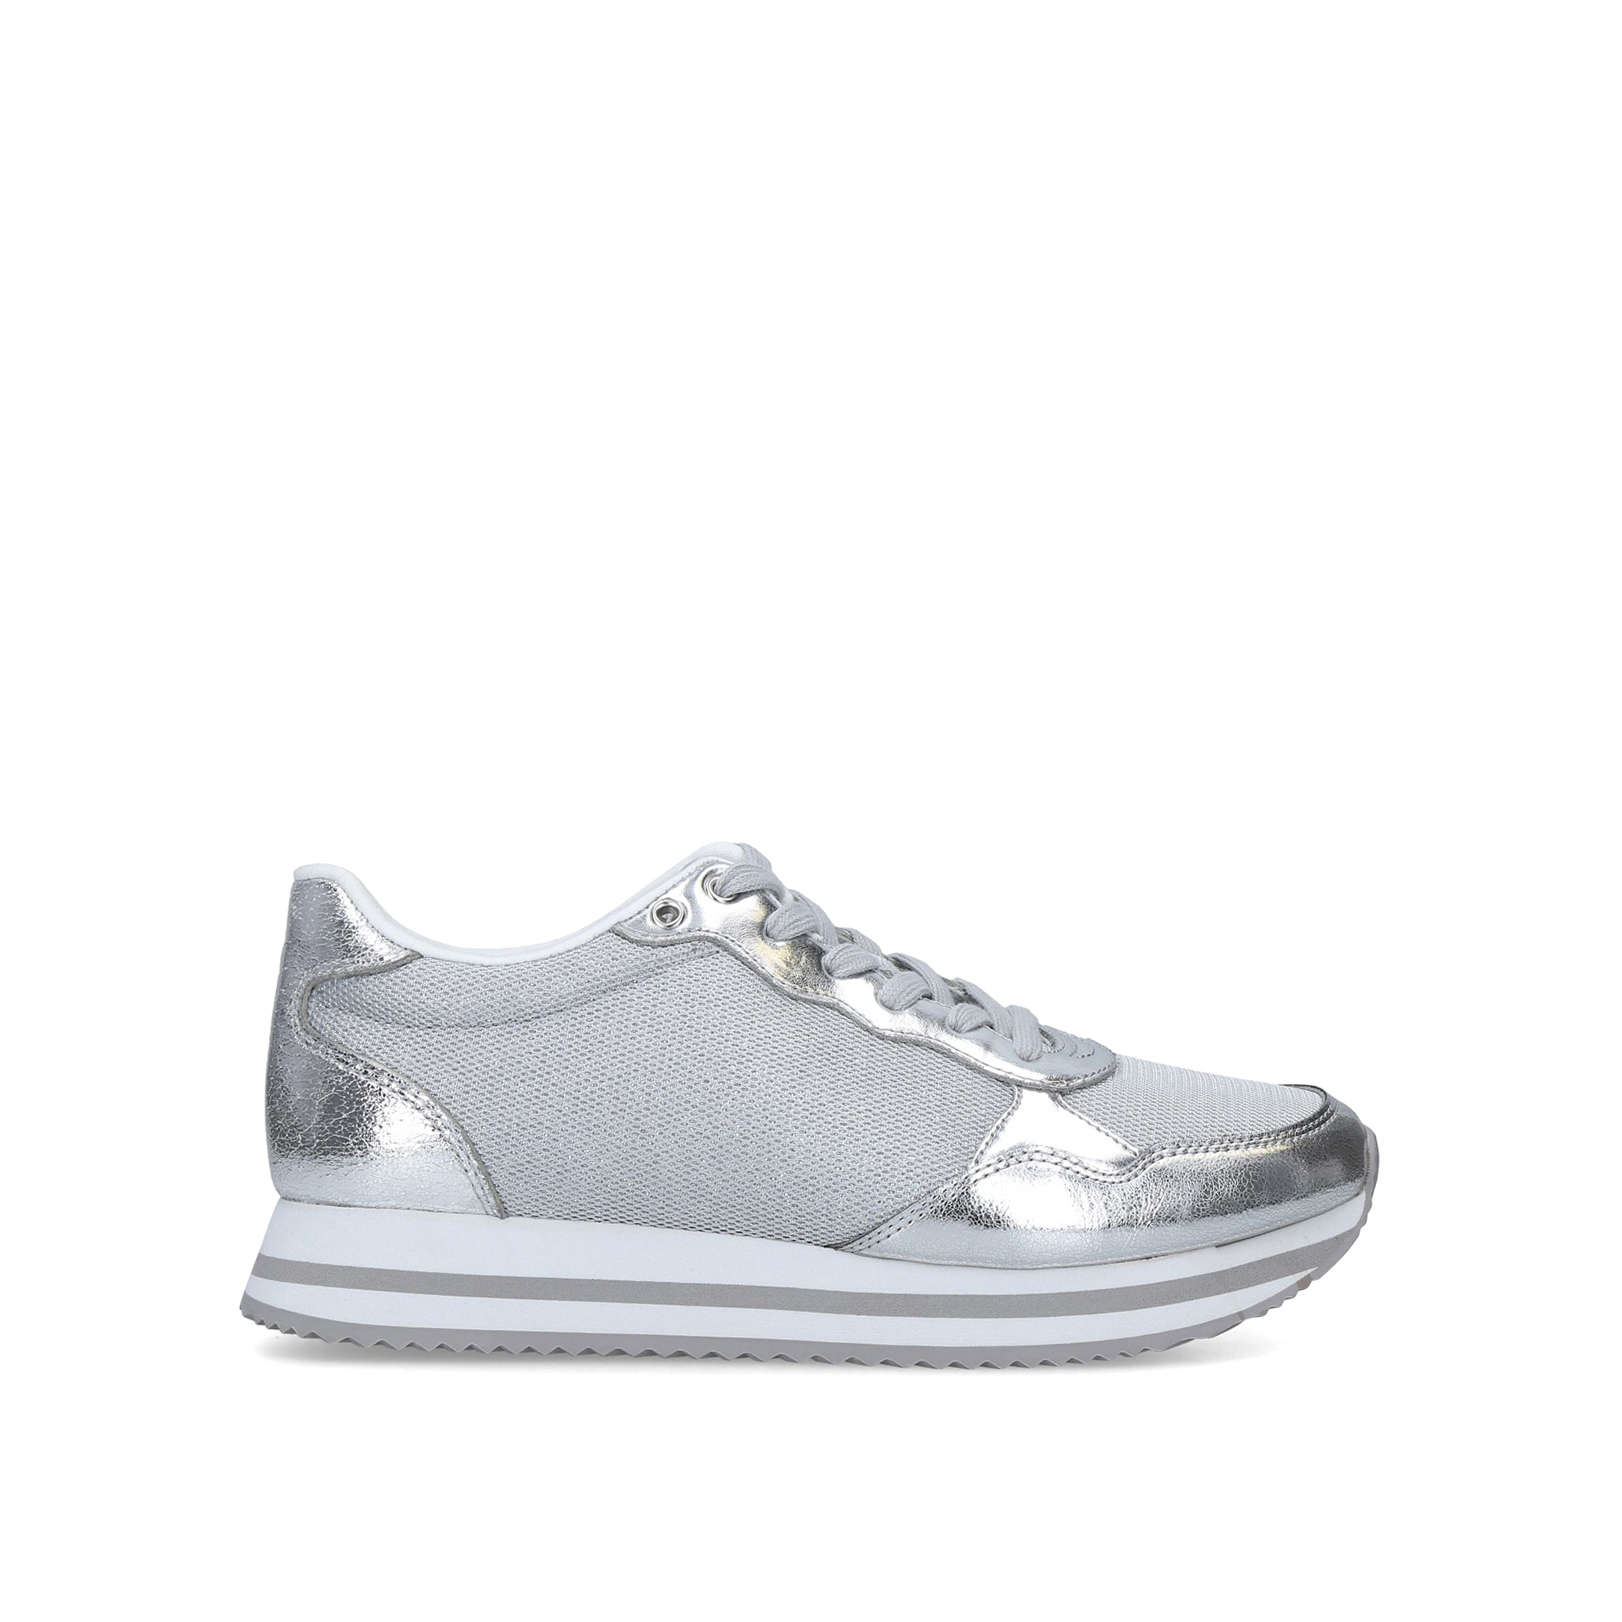 aldo silver sneakers